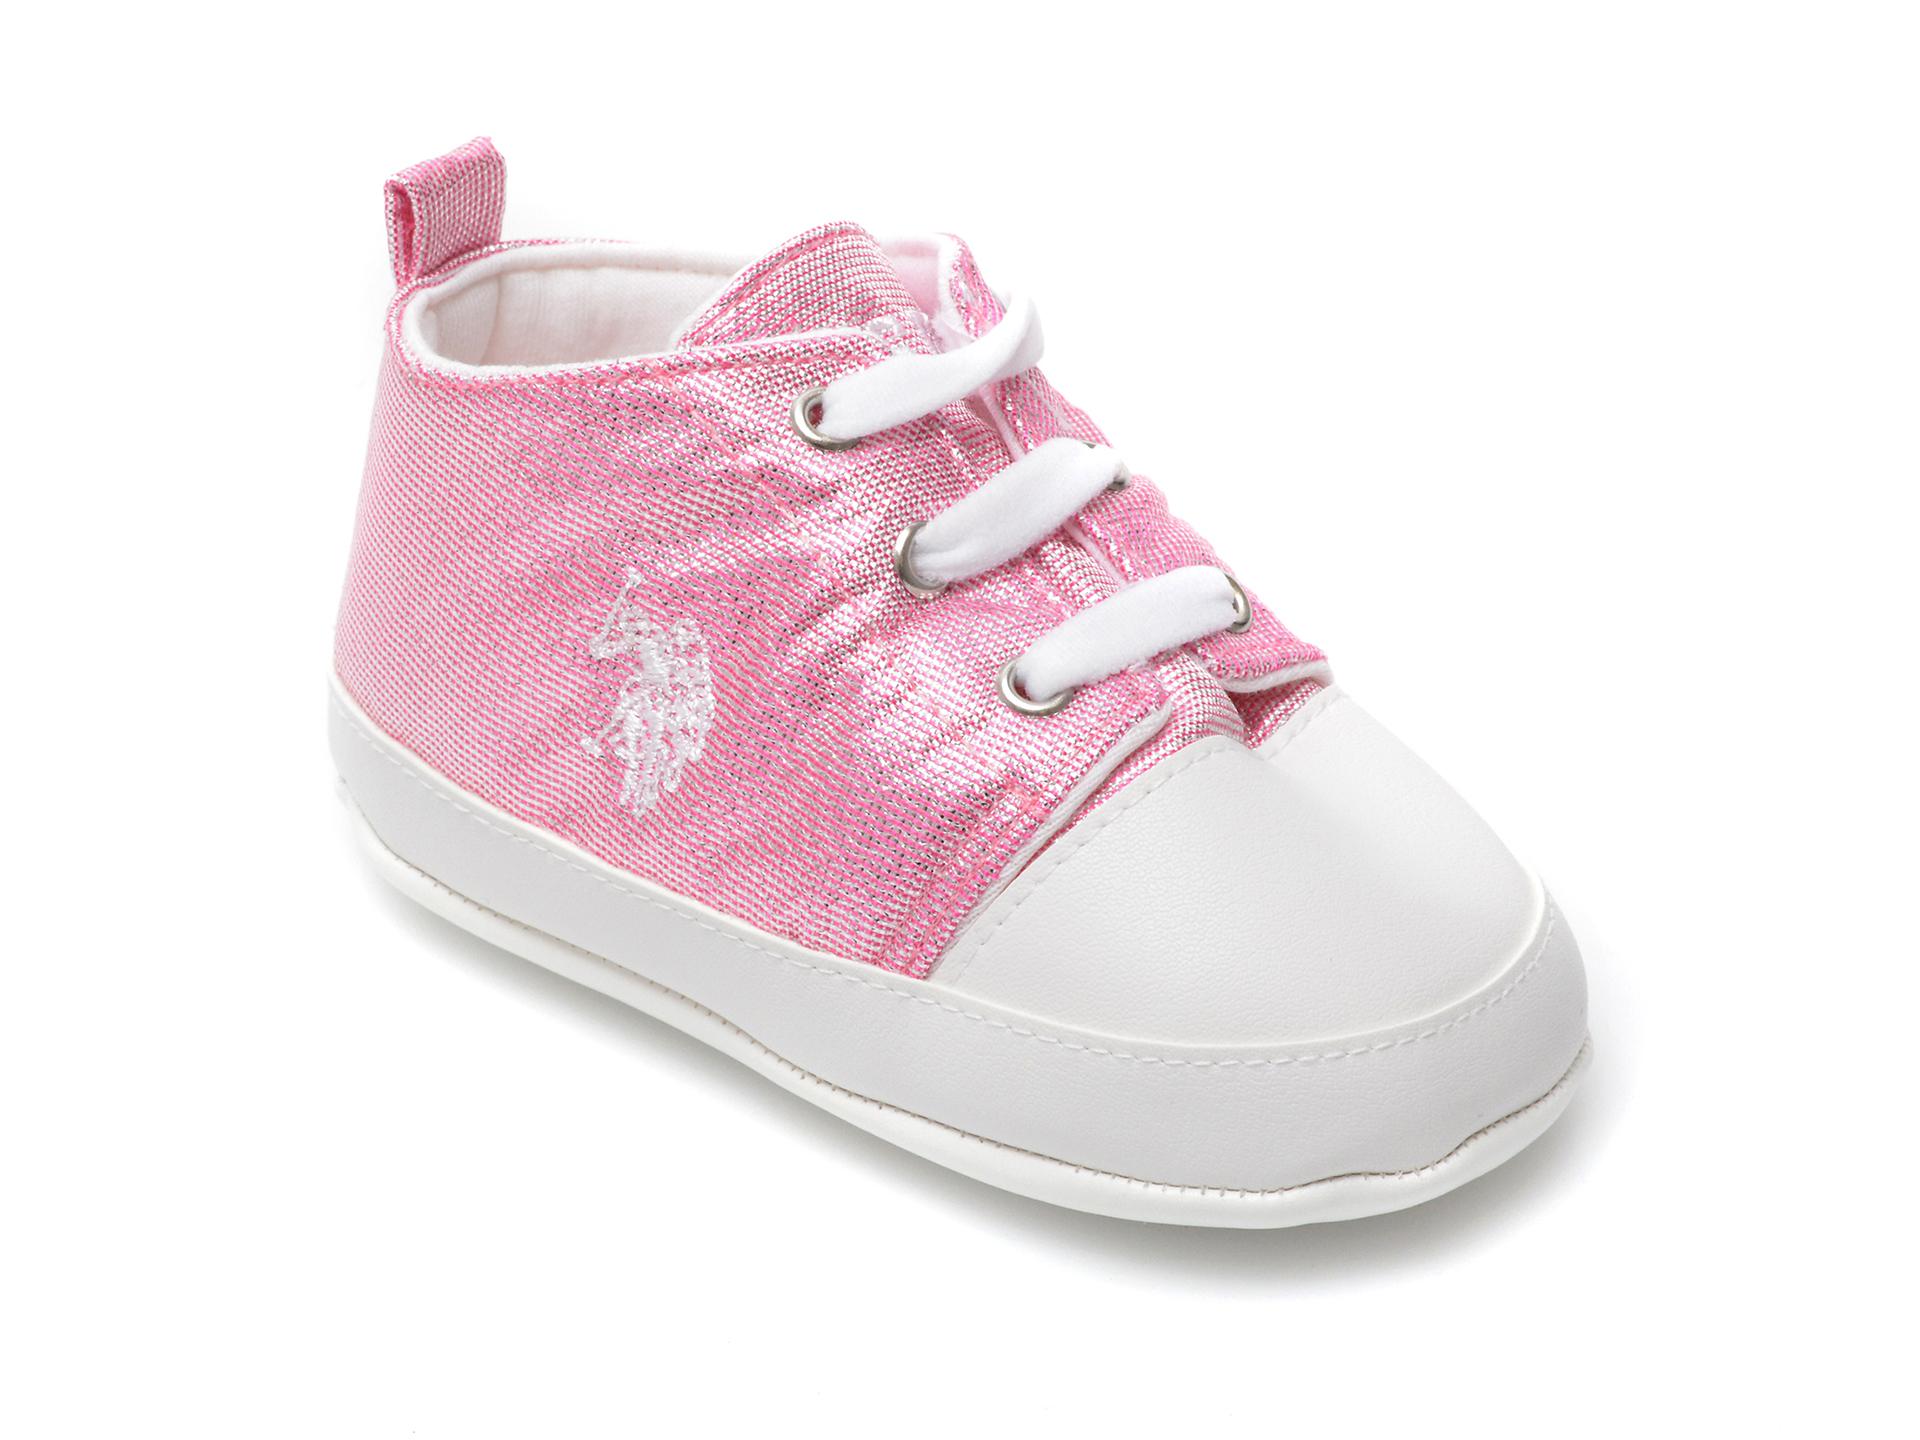 Pantofi US POLO ASSN roz, LICK1FX, din material textil